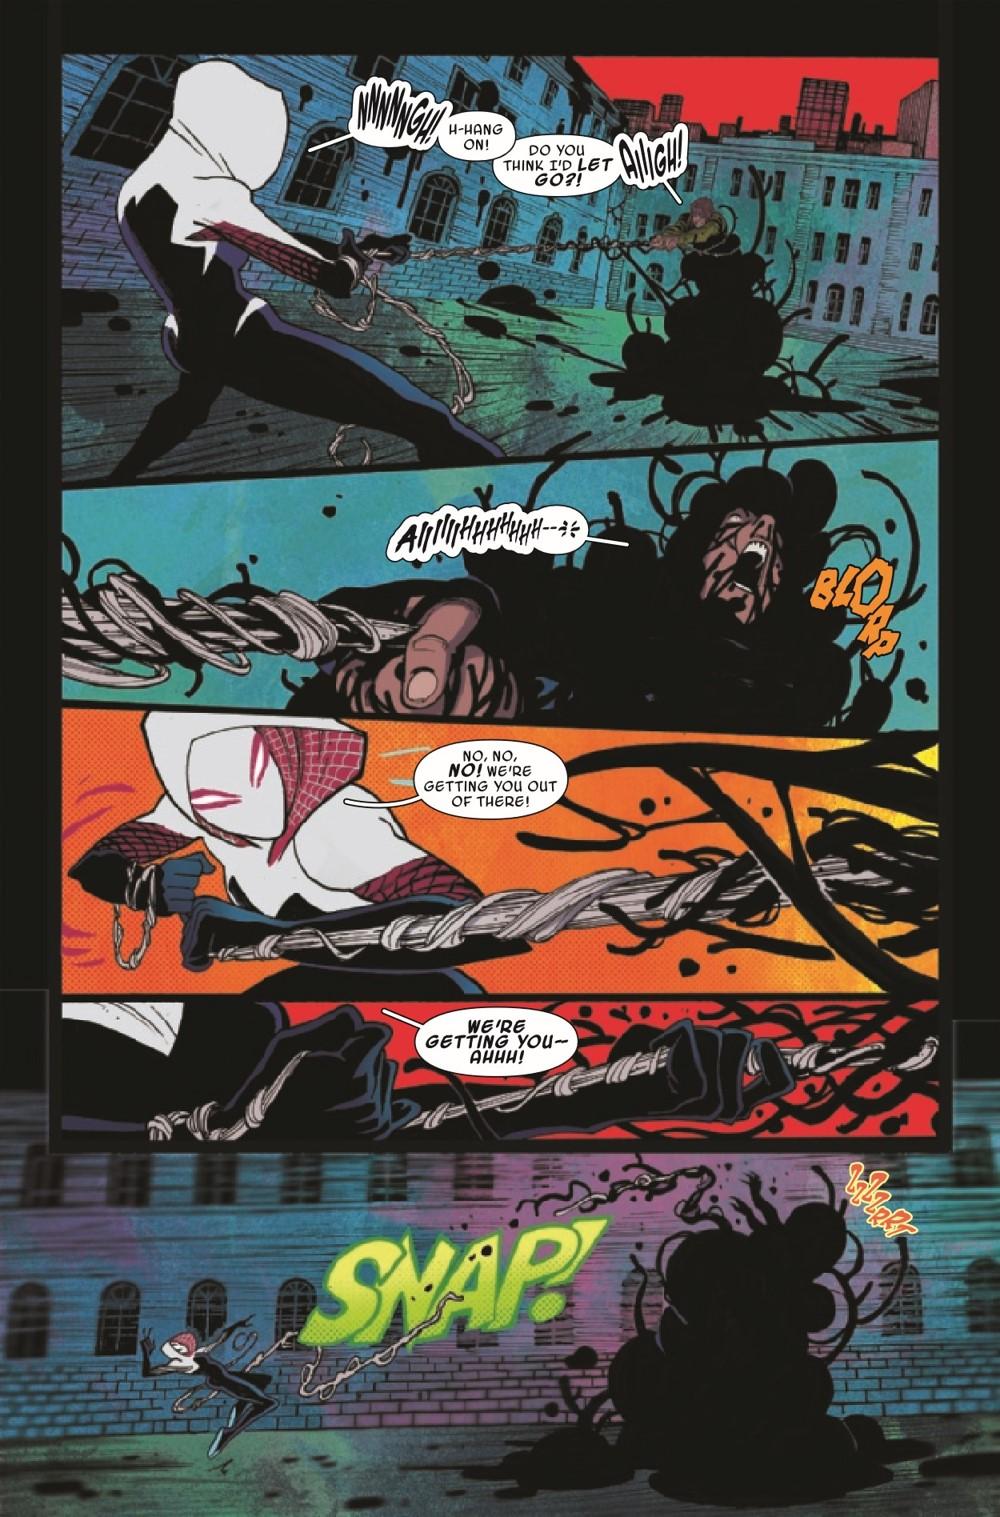 GWENOMVSCARNKIB2021001_Preview-6 ComicList Previews: KING IN BLACK GWENOM VS CARNAGE #1 (OF 3)